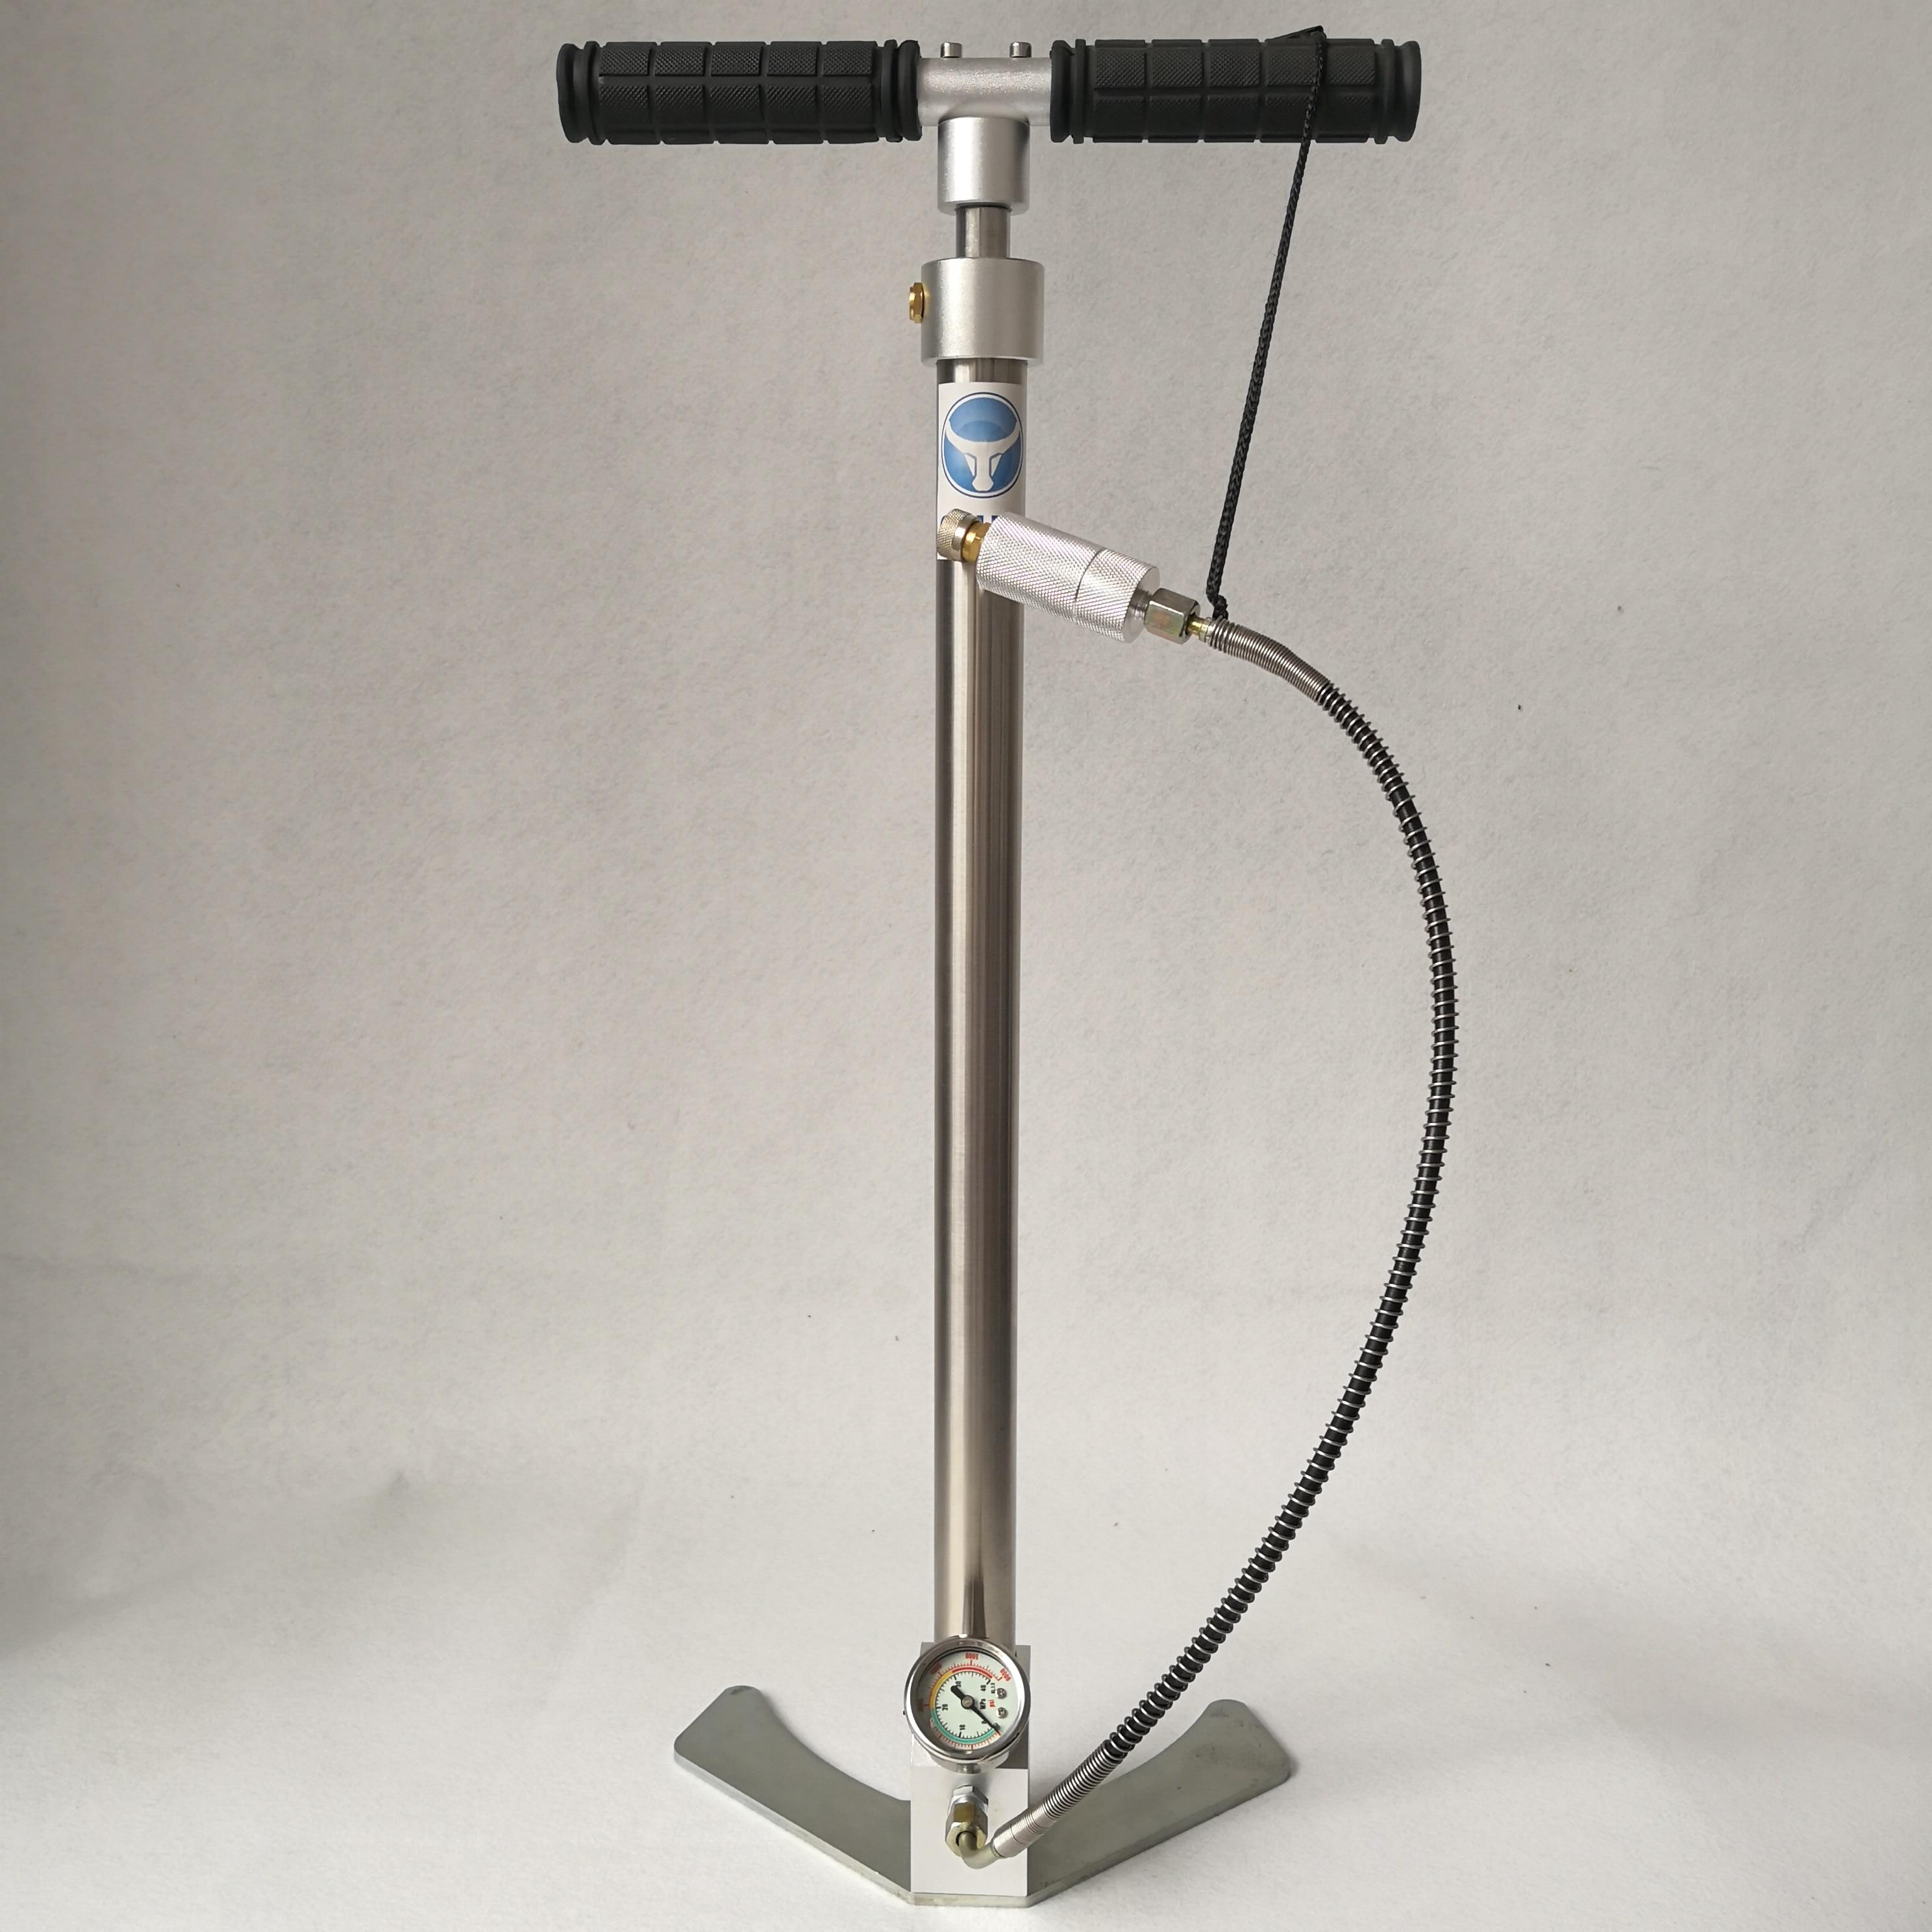 High pressure BULL pcp hand pump 4500psi 300bar with air filter